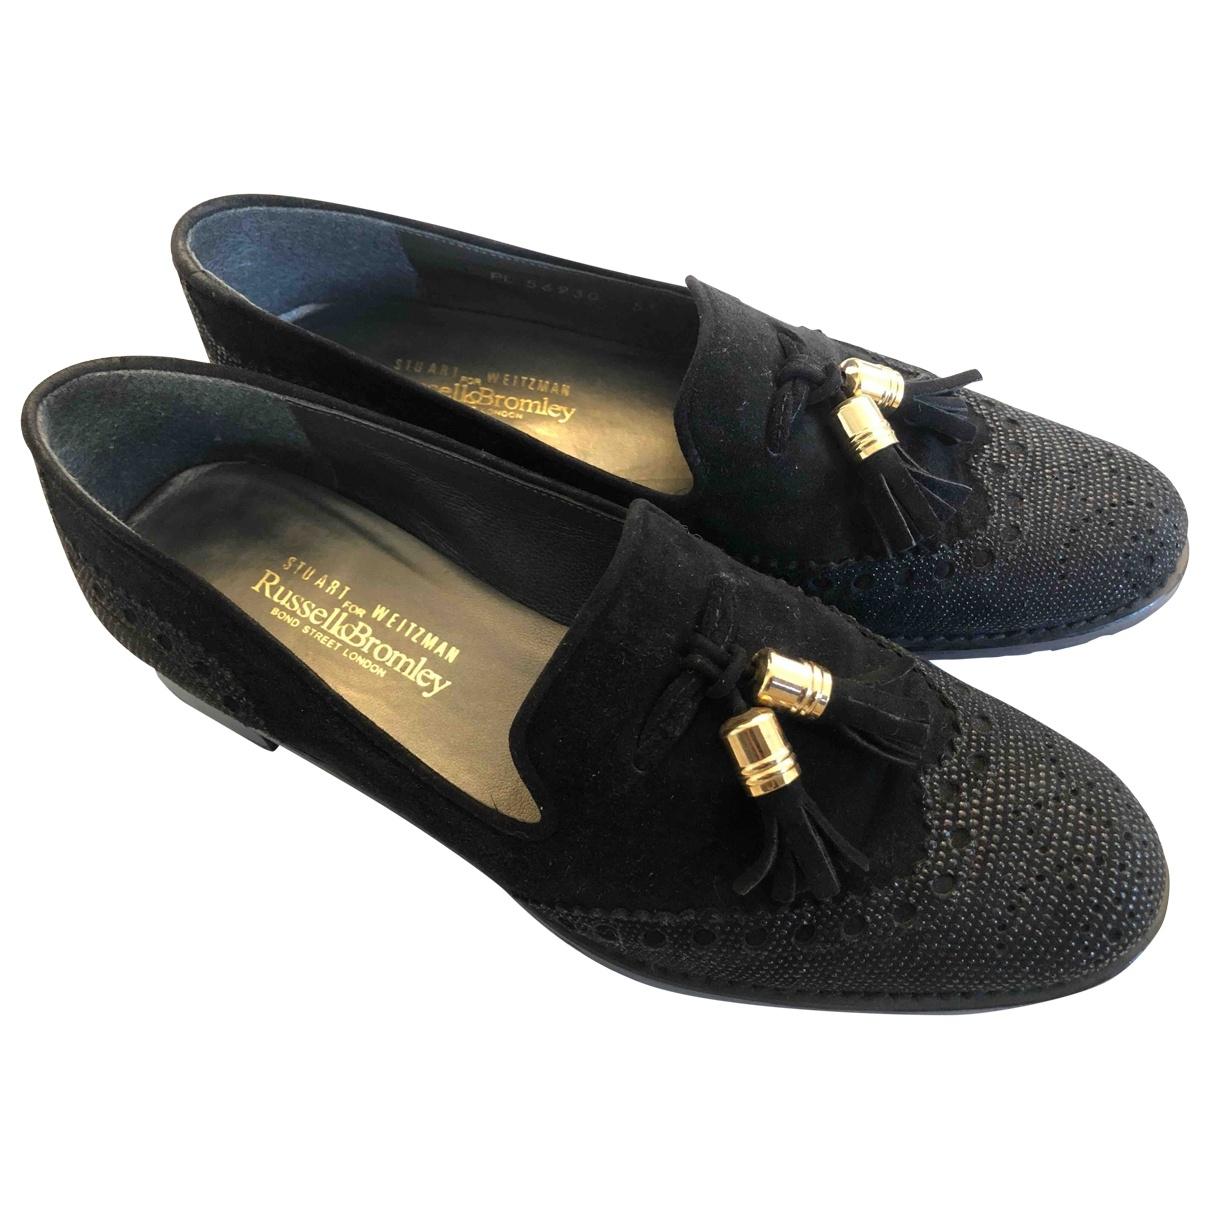 Stuart Weitzman \N Black Leather Flats for Women 3.5 UK